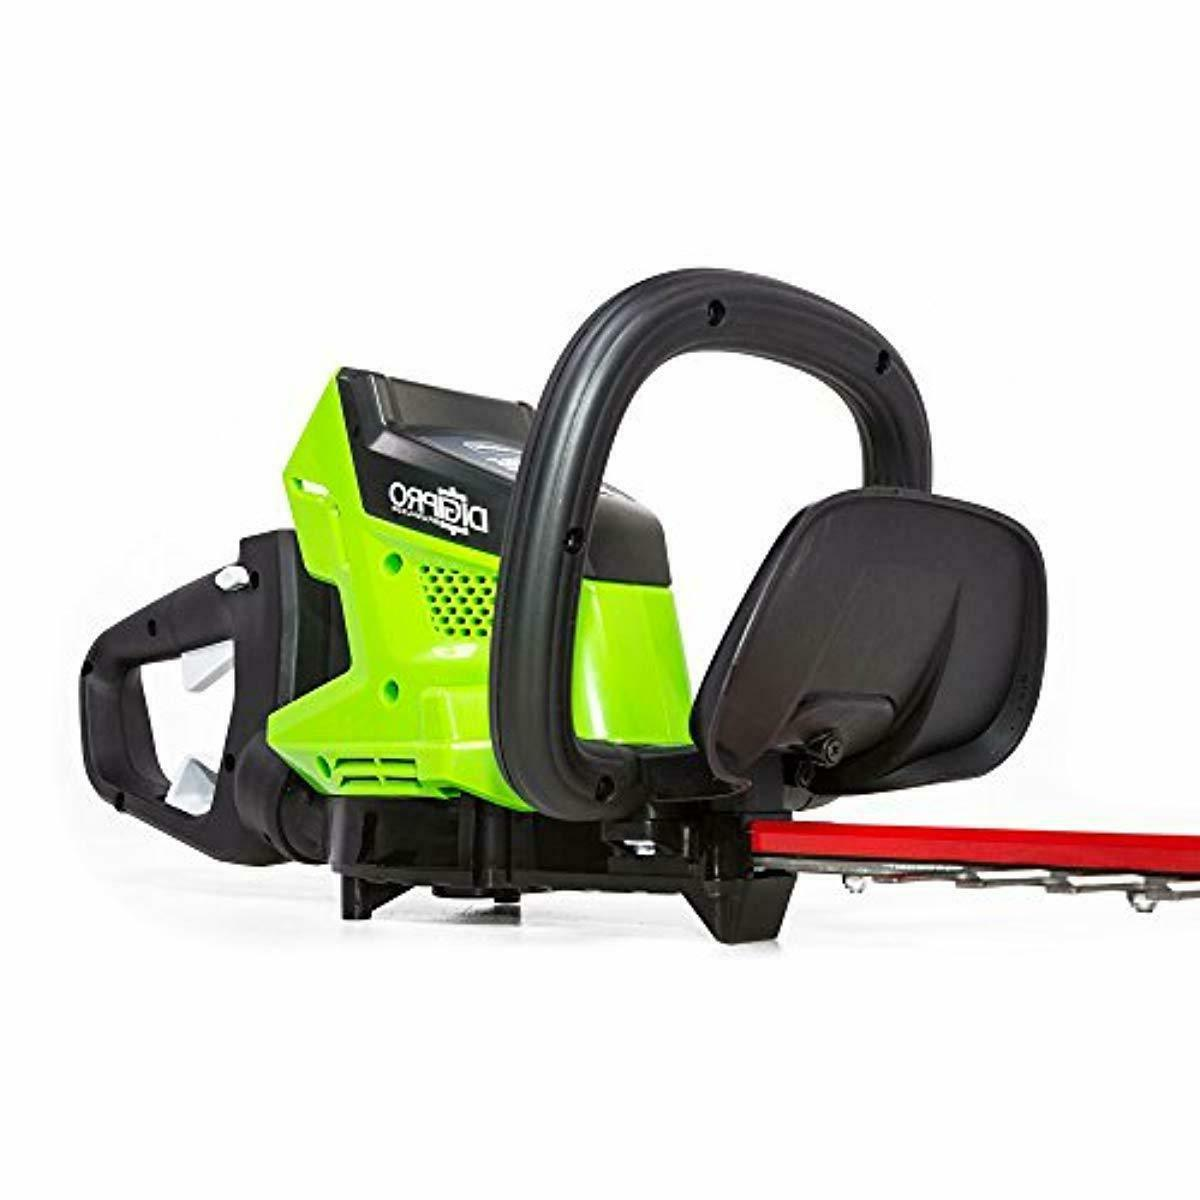 Greenworks HT40L00 Hedge Trimmer, Not Included,